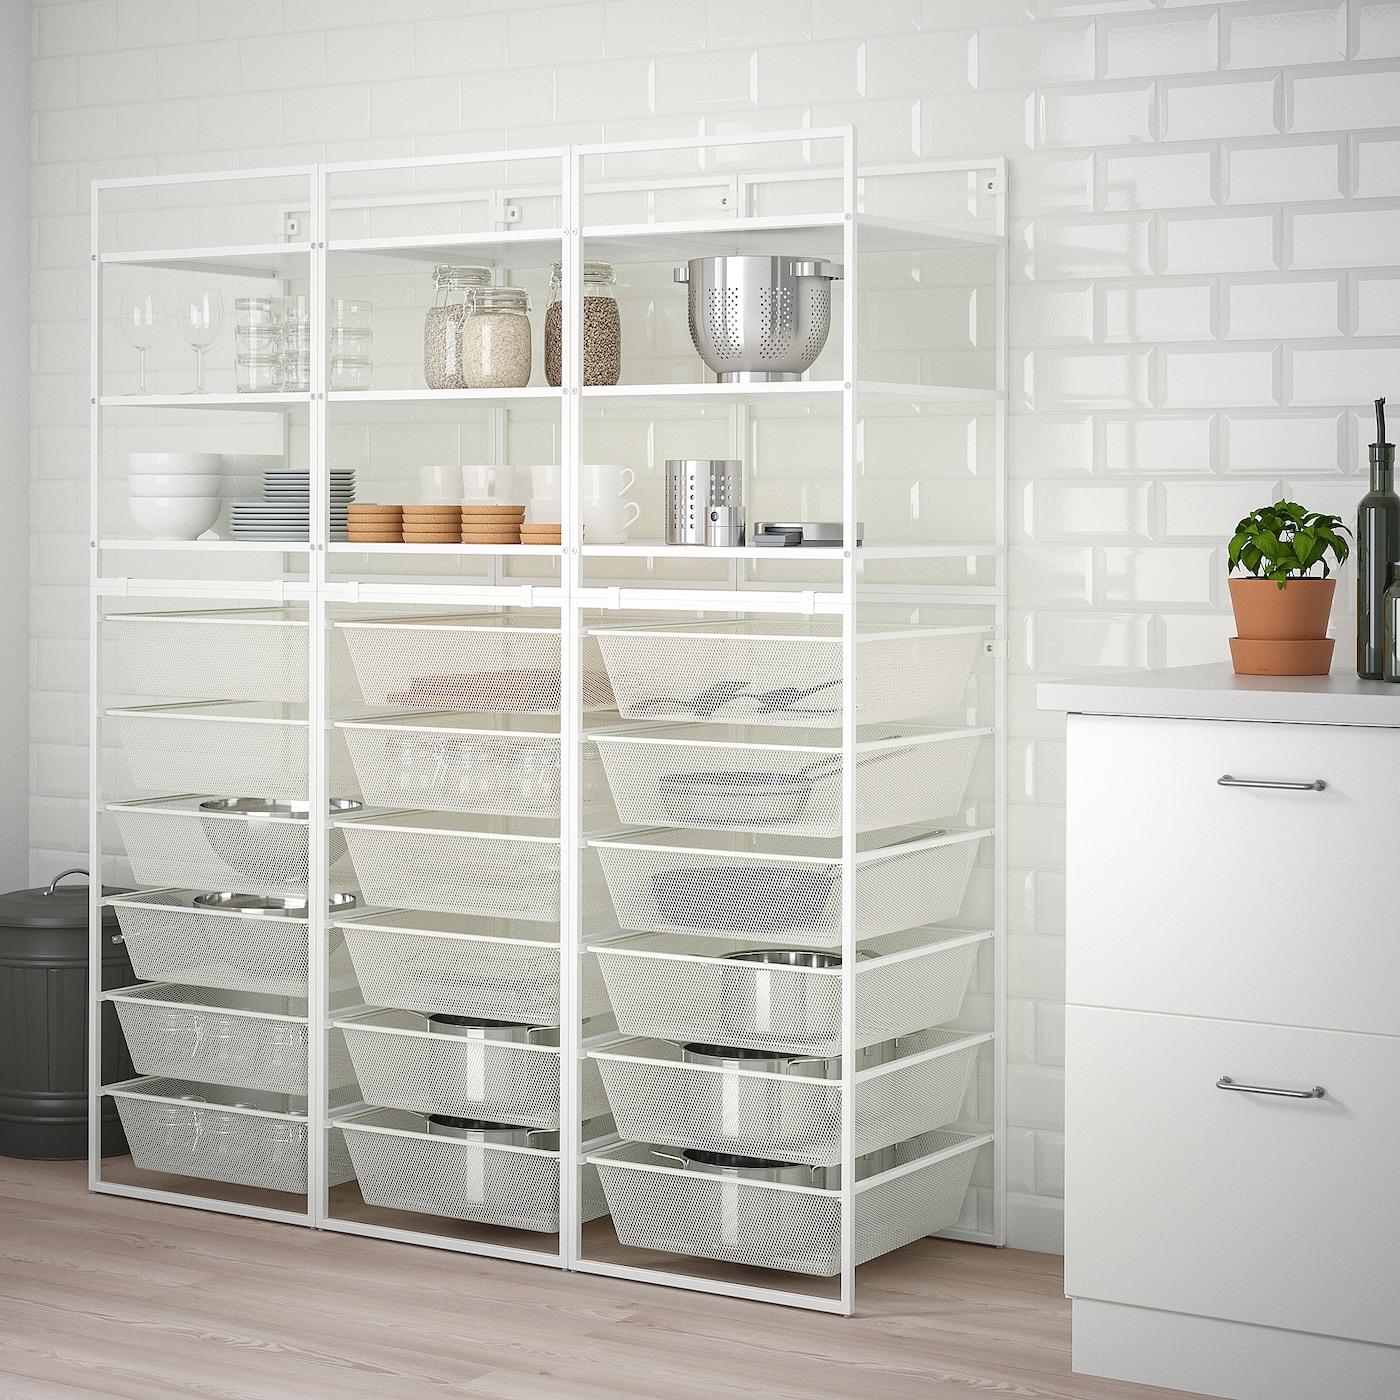 JONAXEL Open storage combination, white, 148x51x173 cm